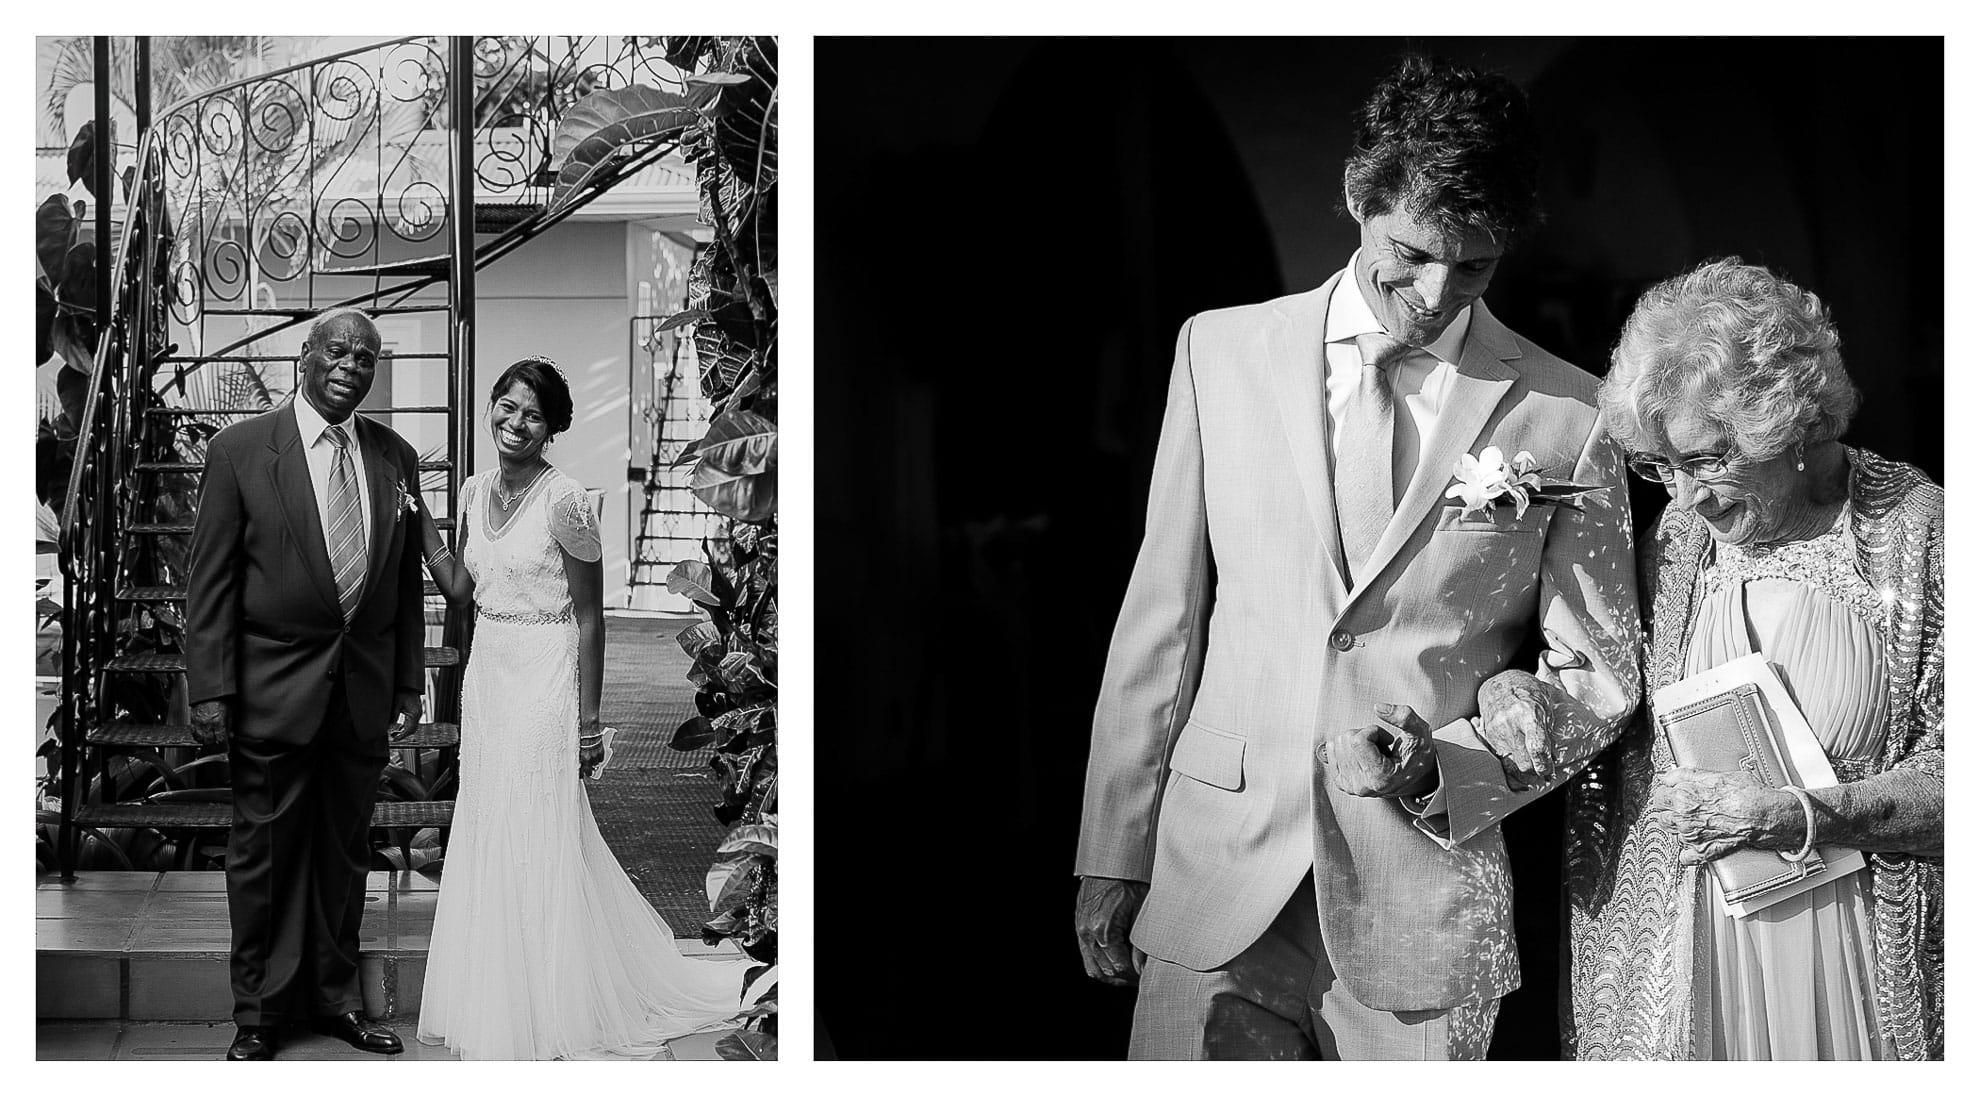 Before wedding photos